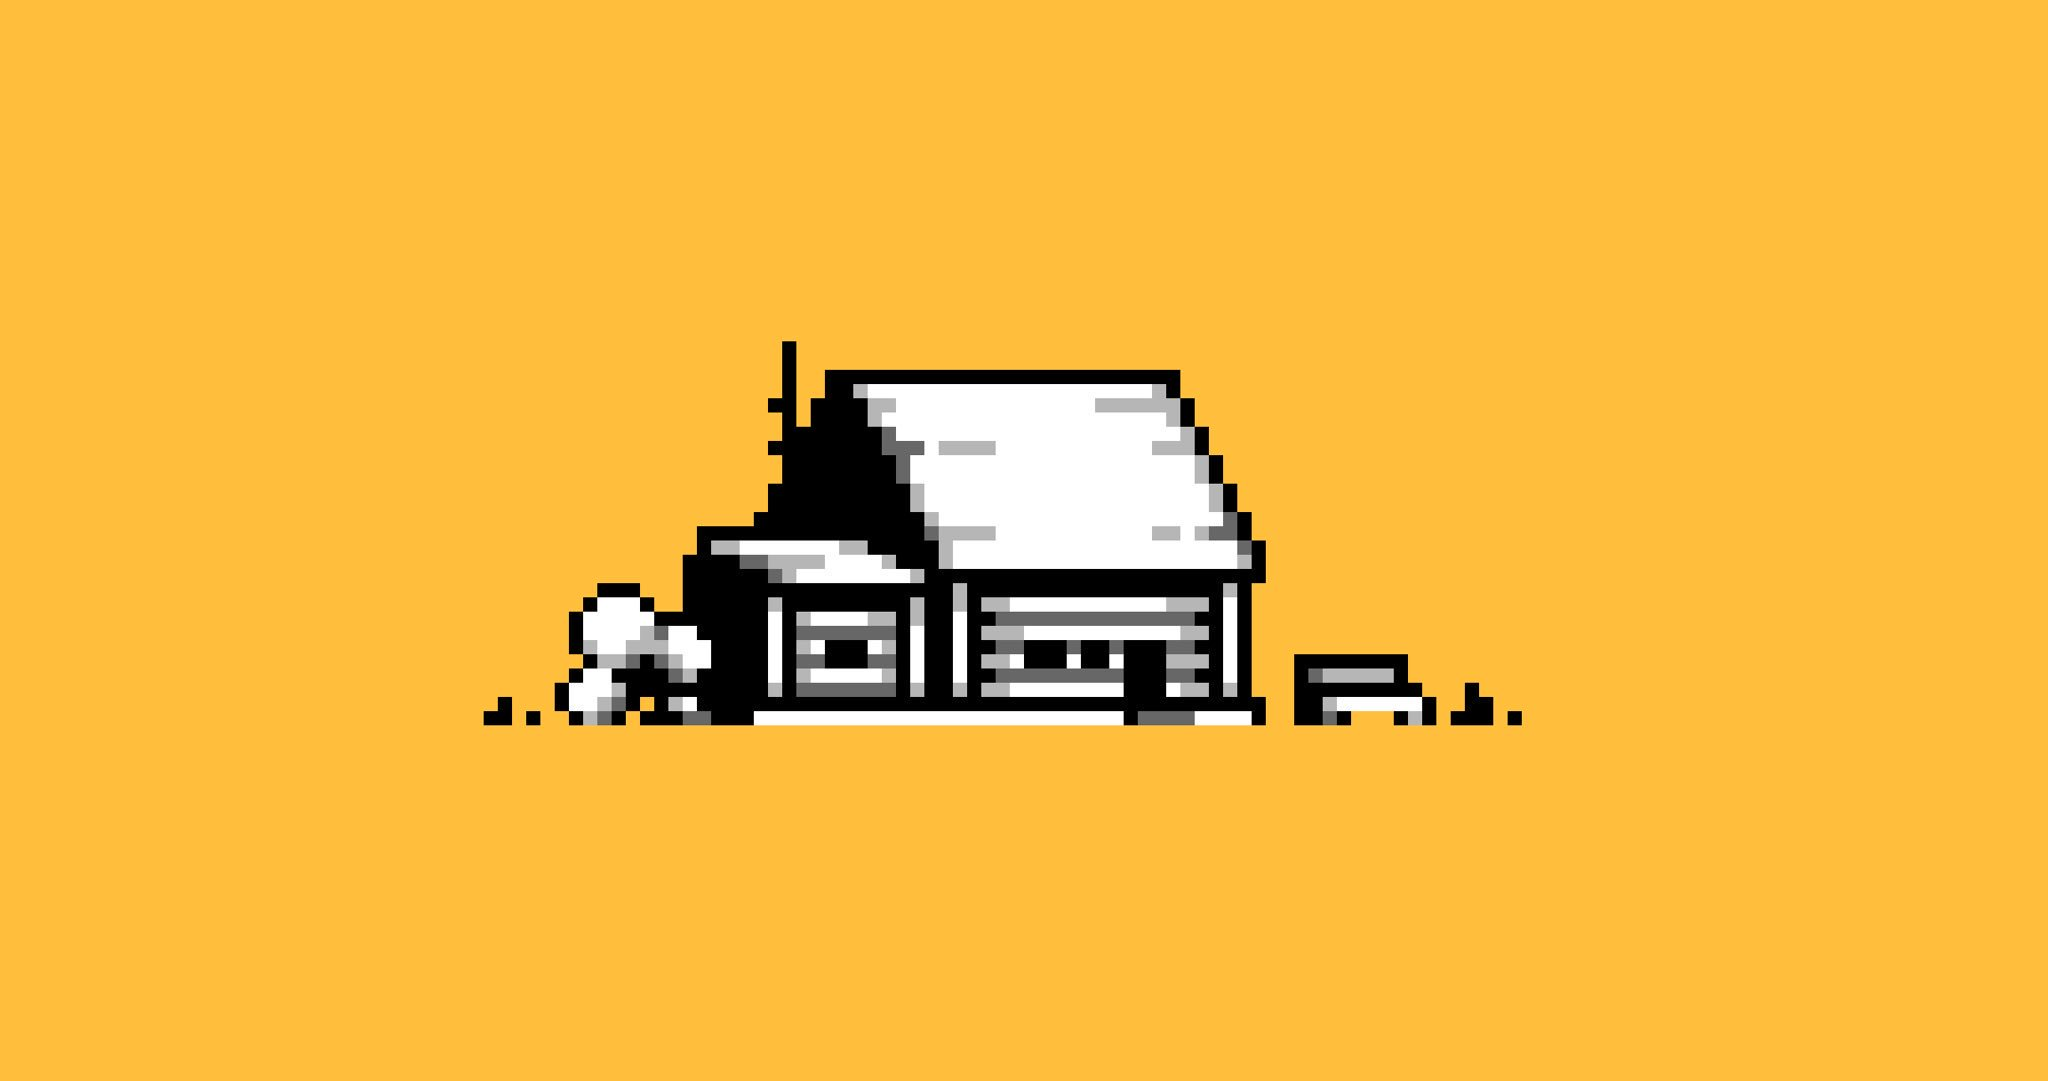 monochrome_house2.jpg